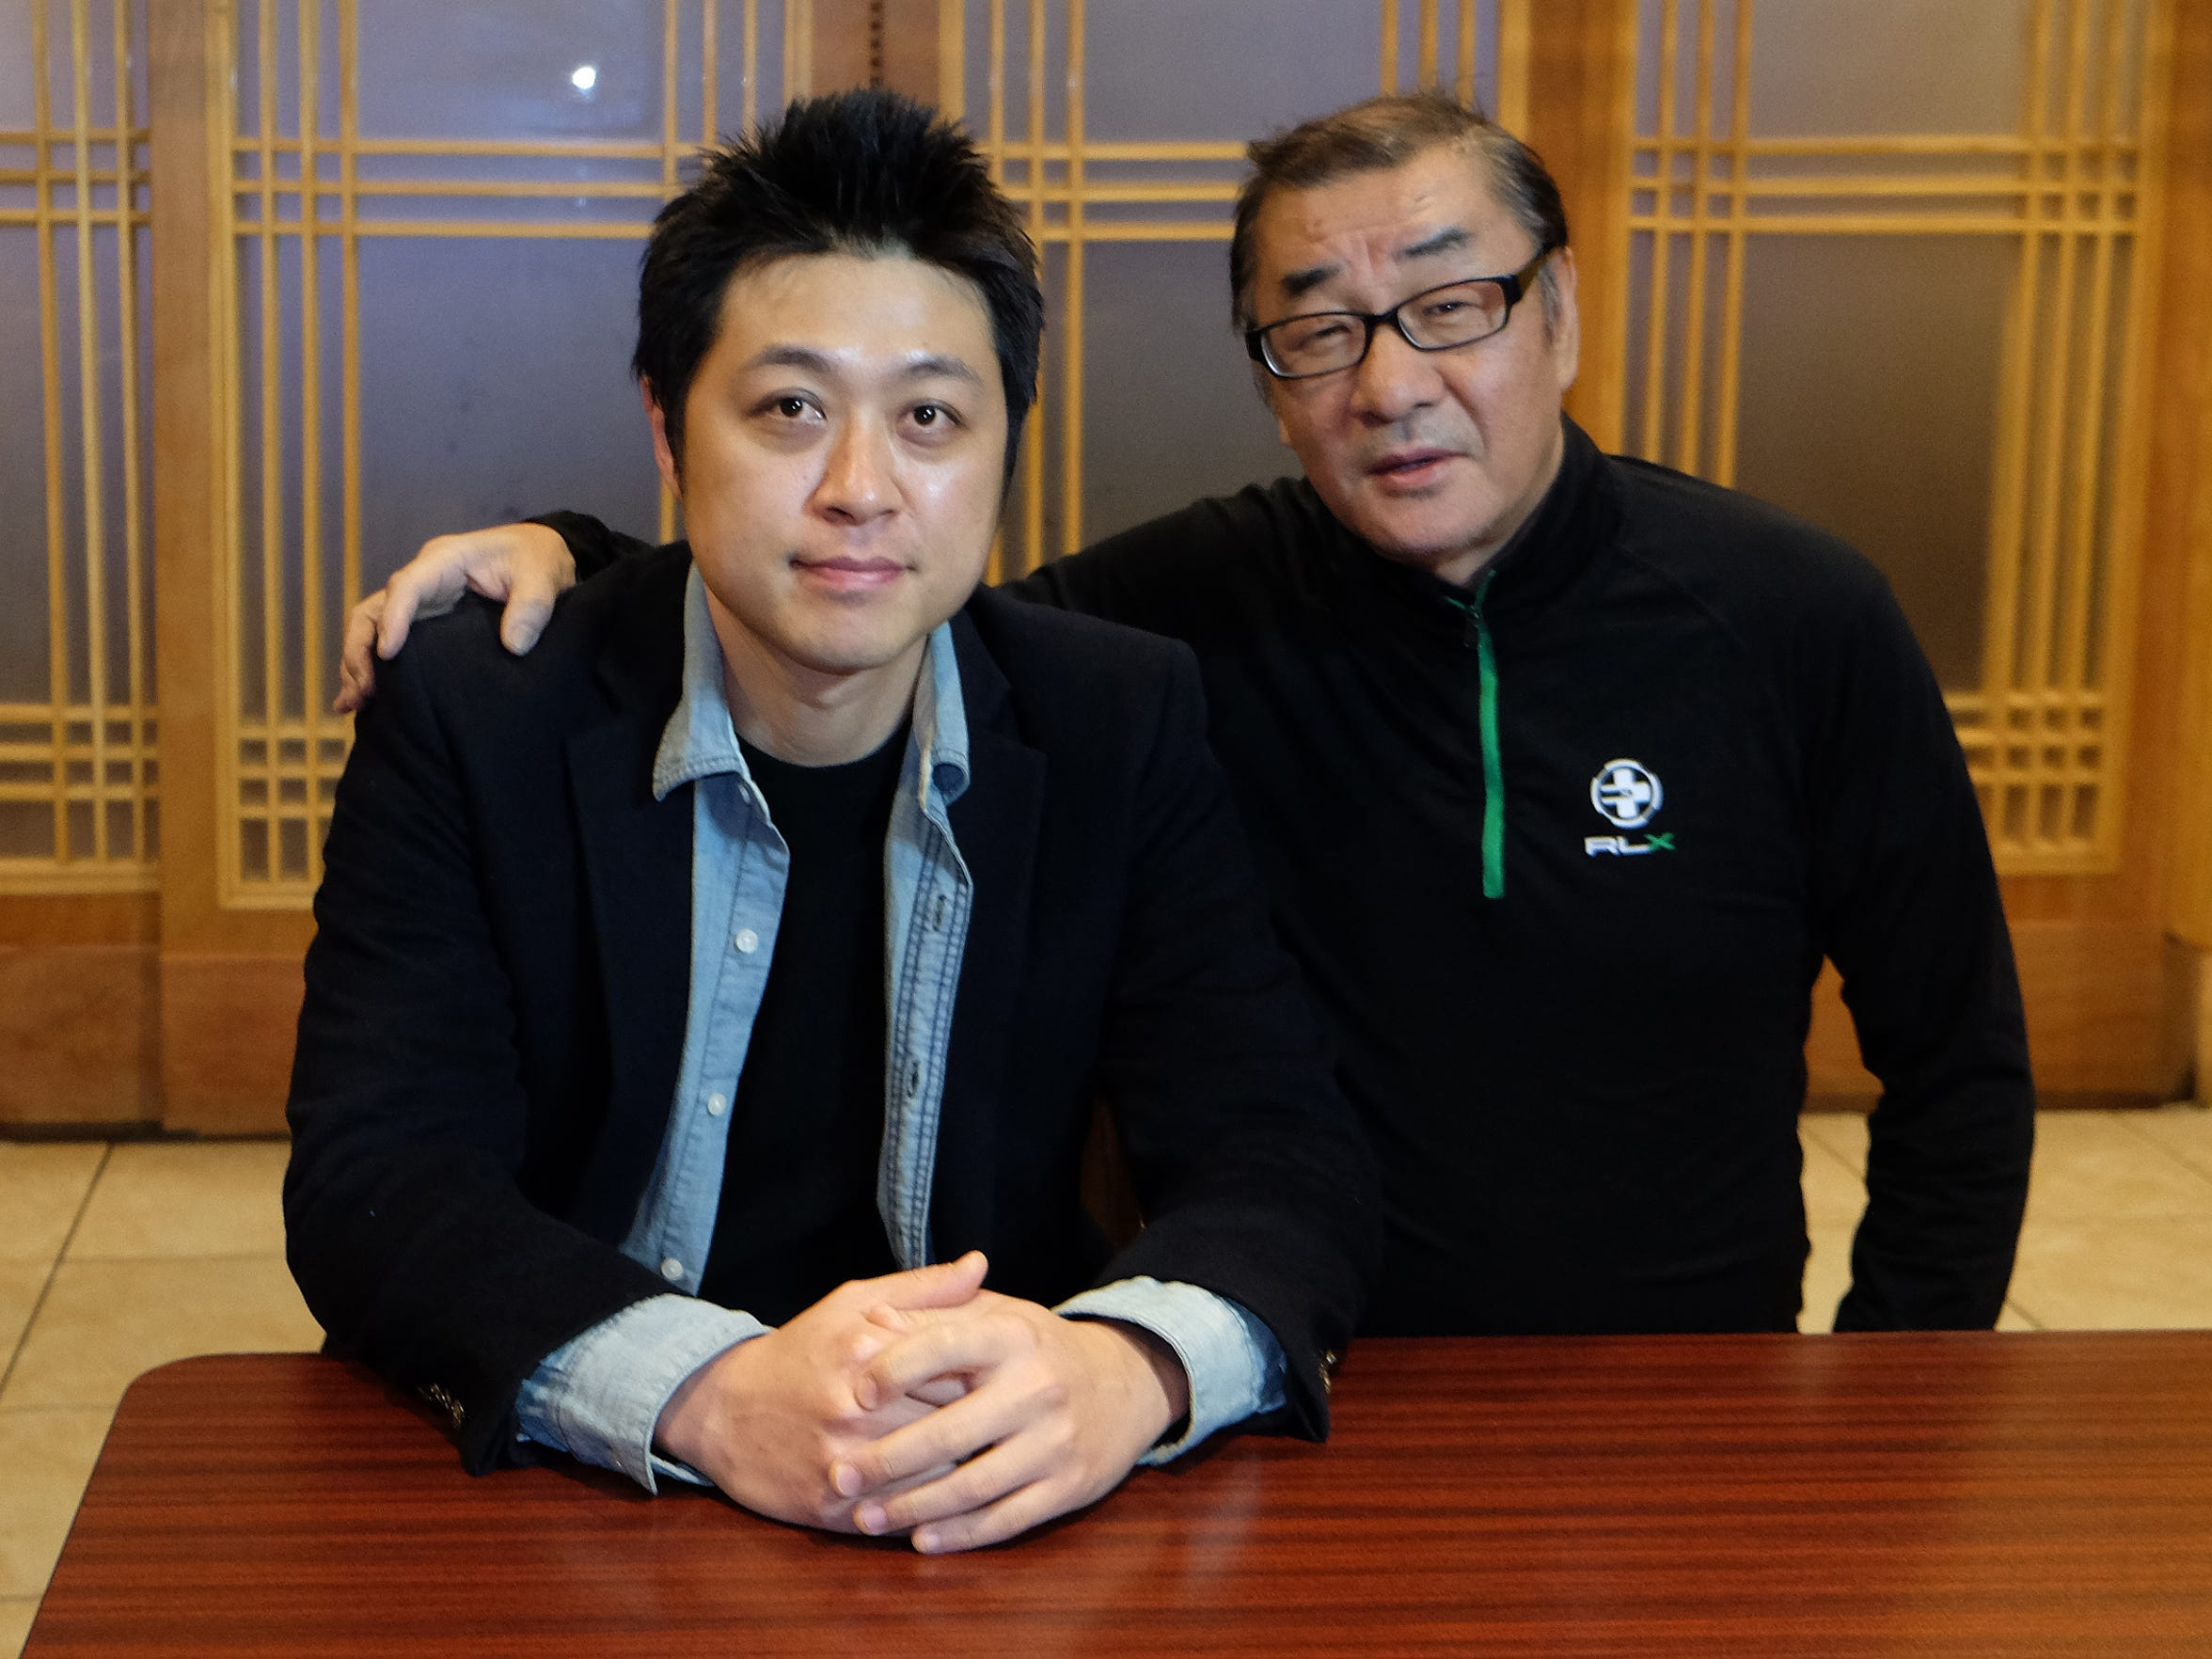 Owner Joe Yoon, right, and son Daniel Yoon at Chung Ki Wa in Sterling Heights.